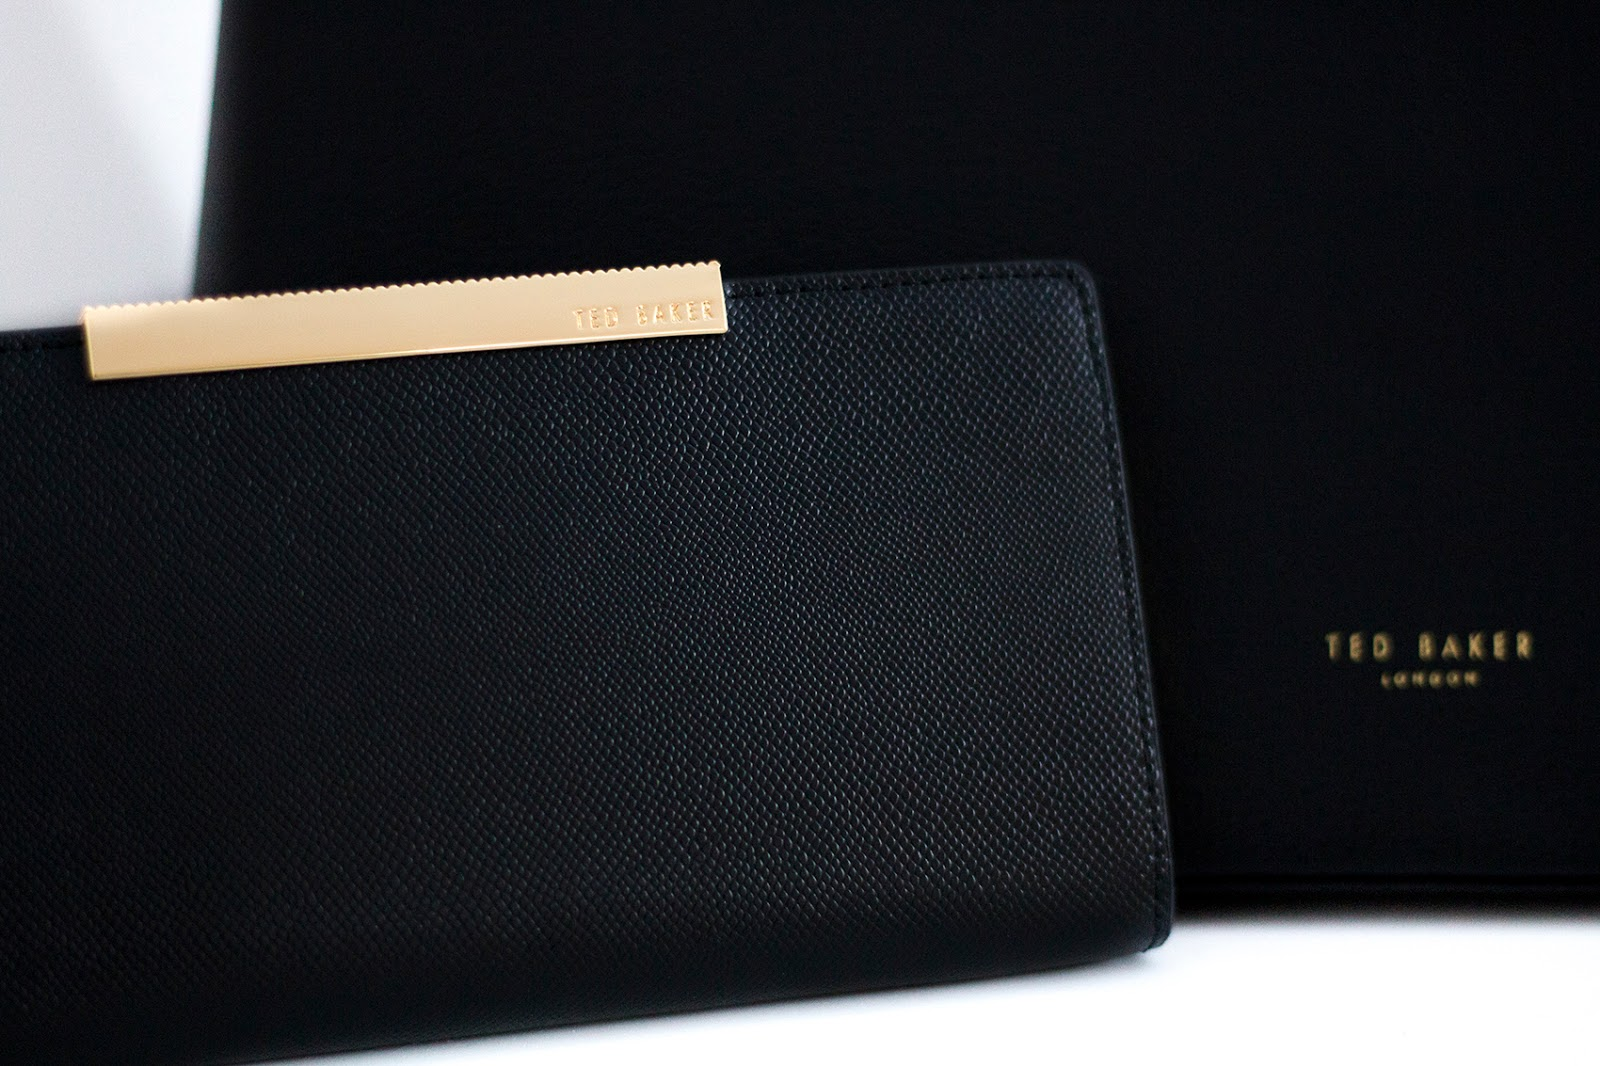 Black Ted Baker purse